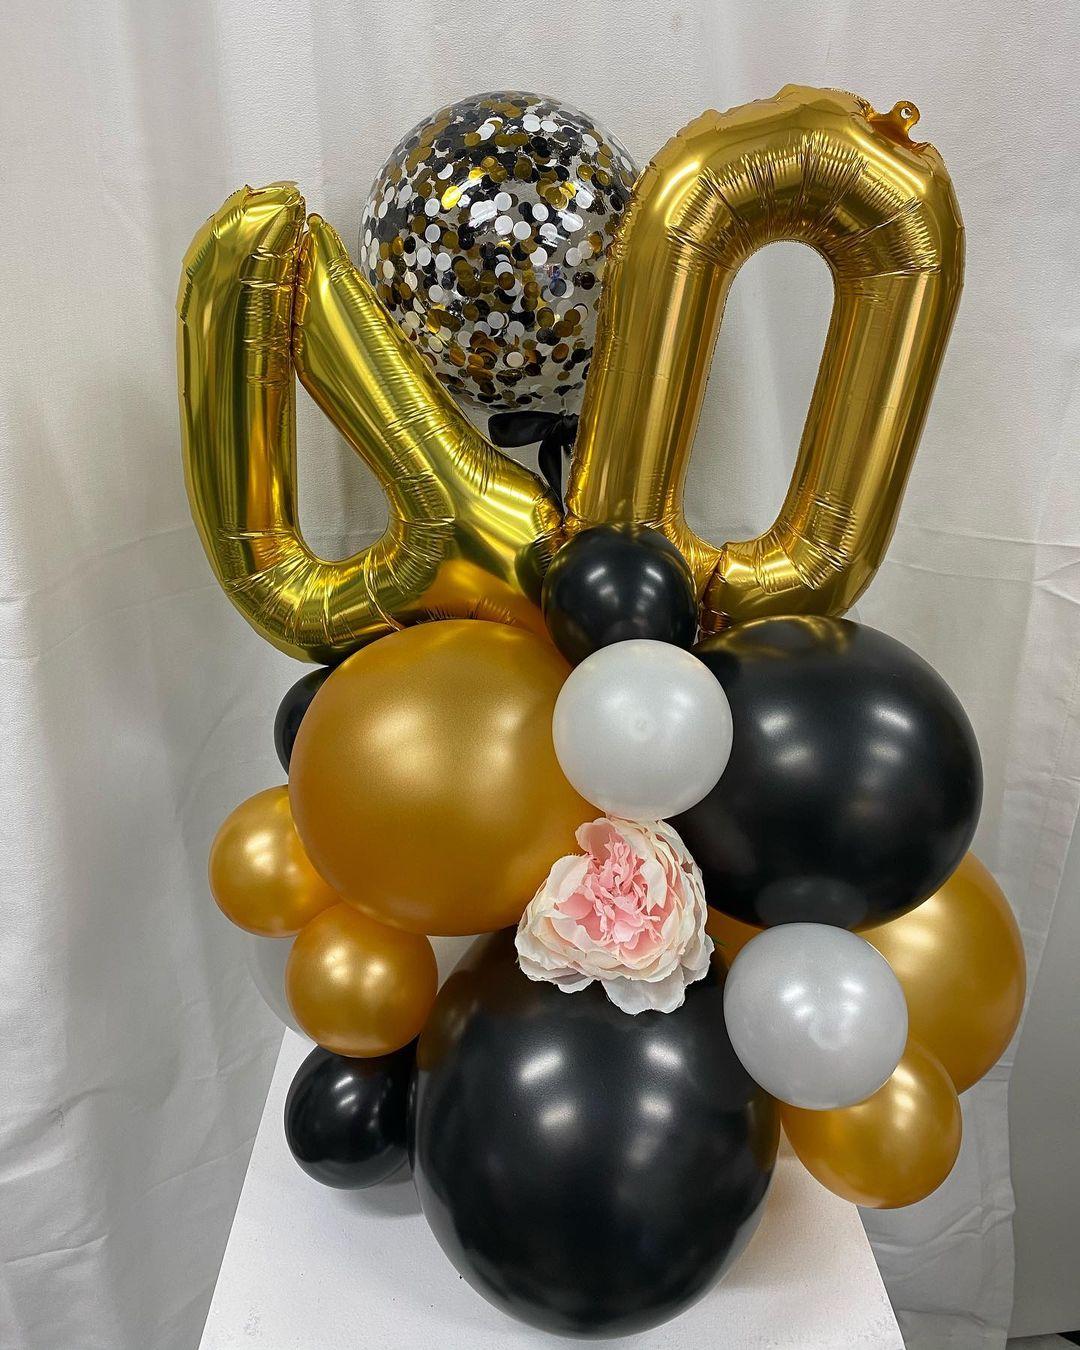 balloonhqgc 195311939 220205573035127 6176054137564639985 n